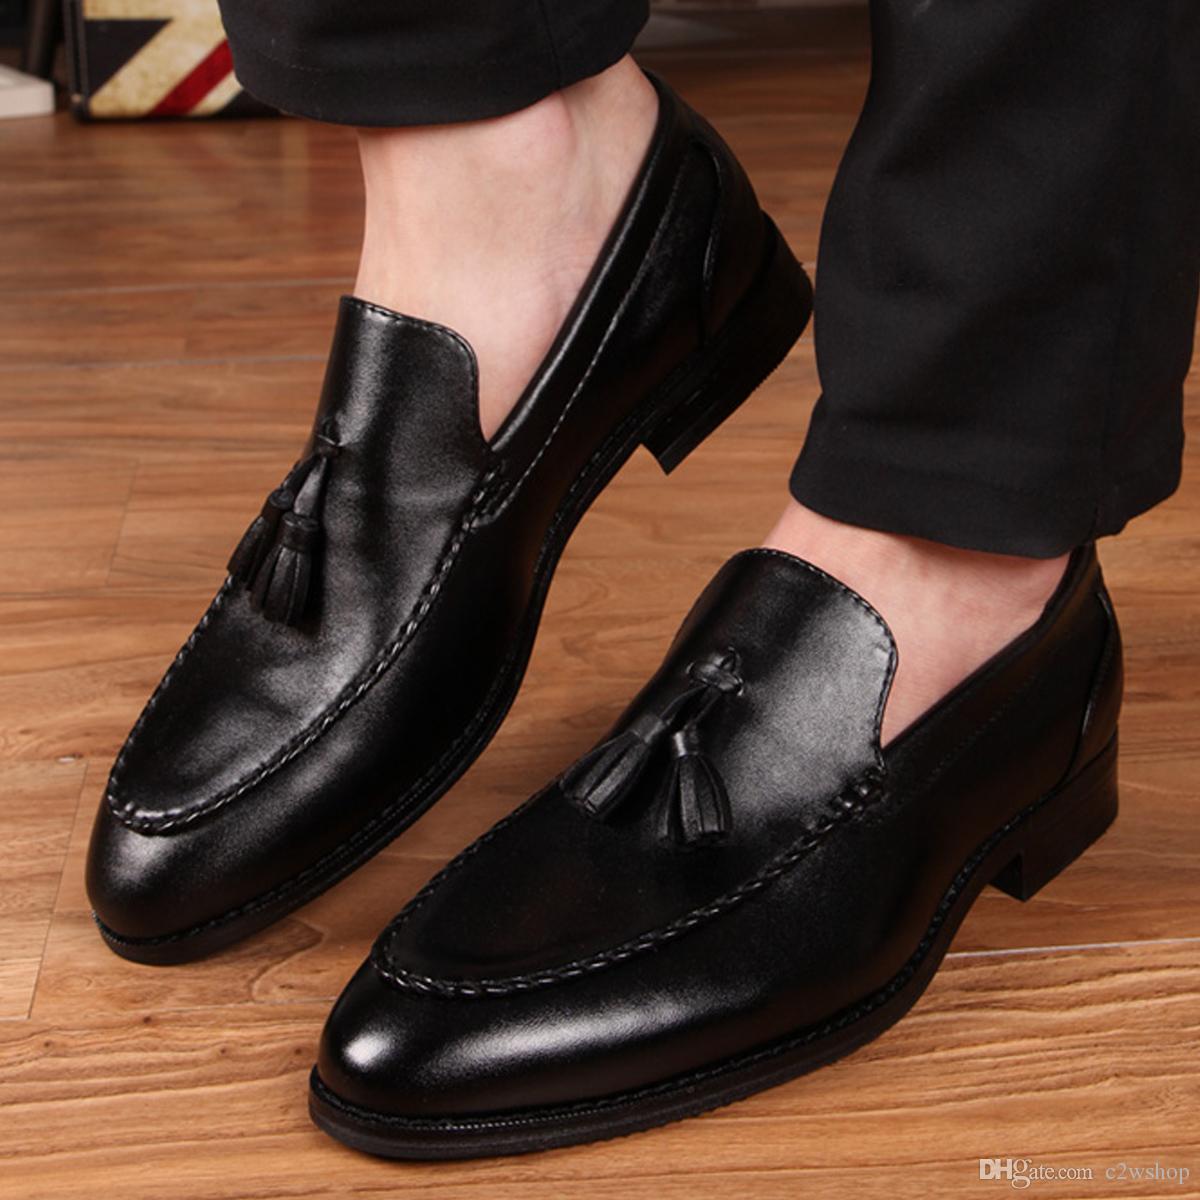 Elegant Charming Quality Leather Tassel Oxfords Shoes Mens